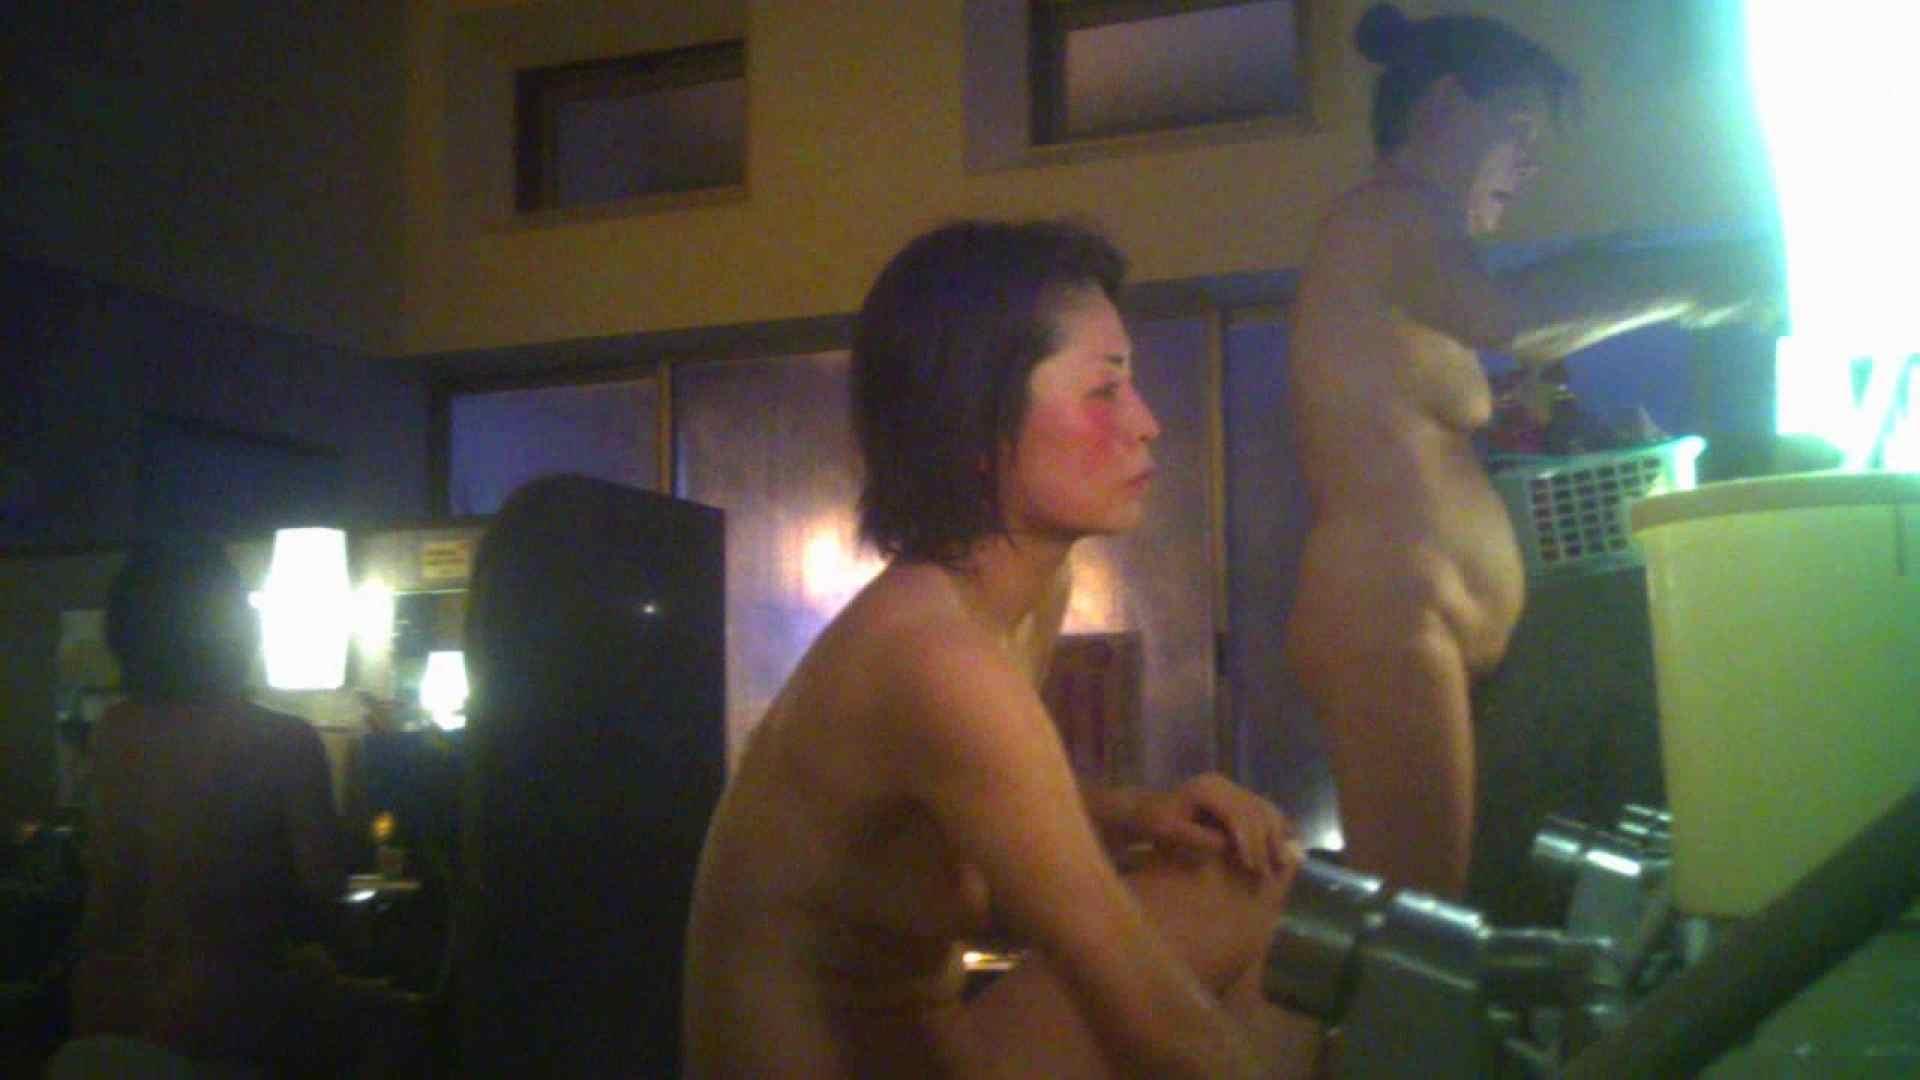 TG.21 【上等兵】井戸端会議が大好きな奥さん 女風呂  69画像 5